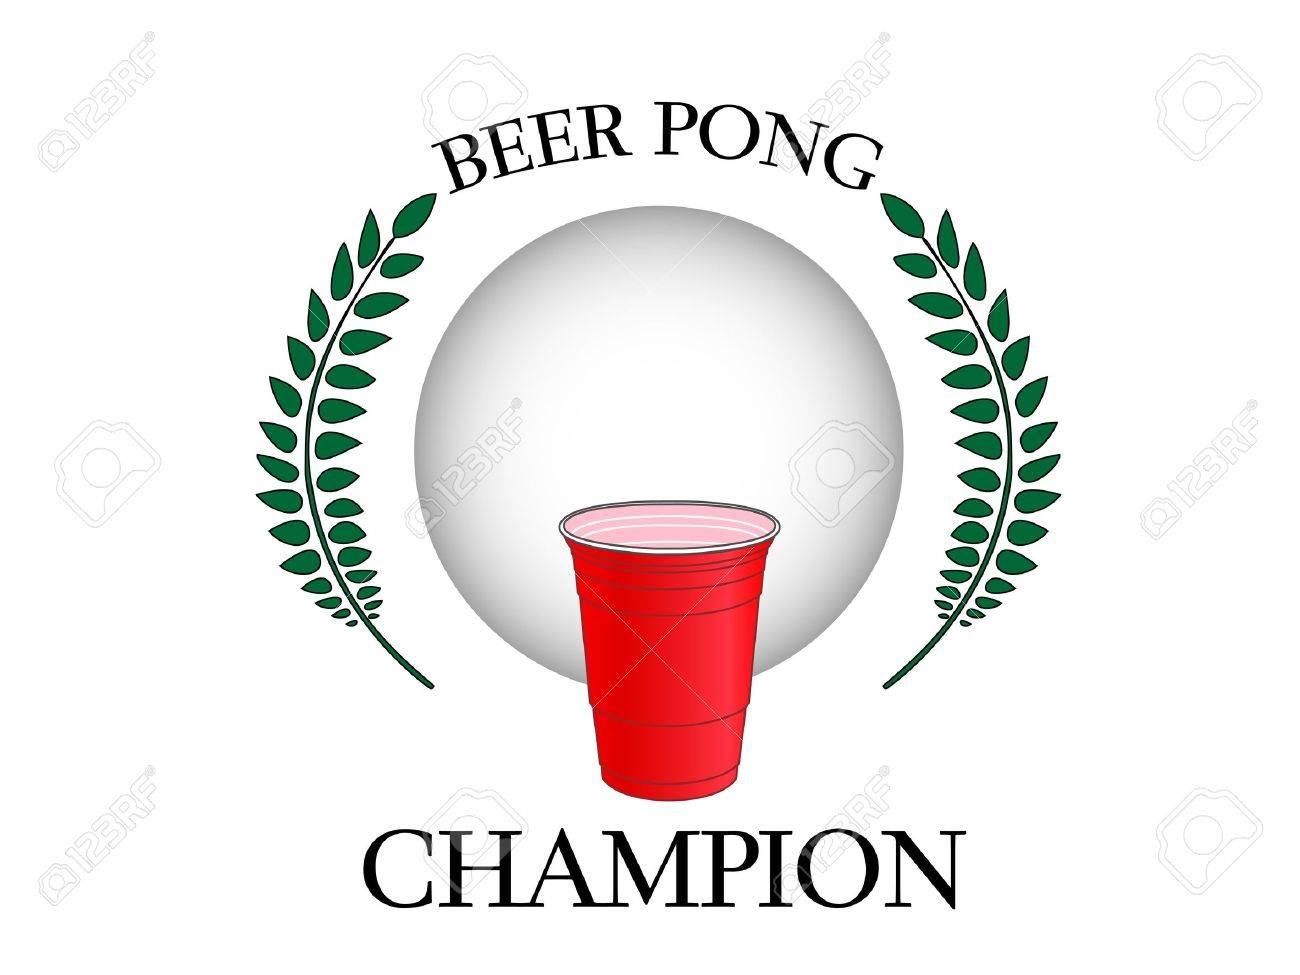 Beer Pong Champion Stock Vector - 11429932